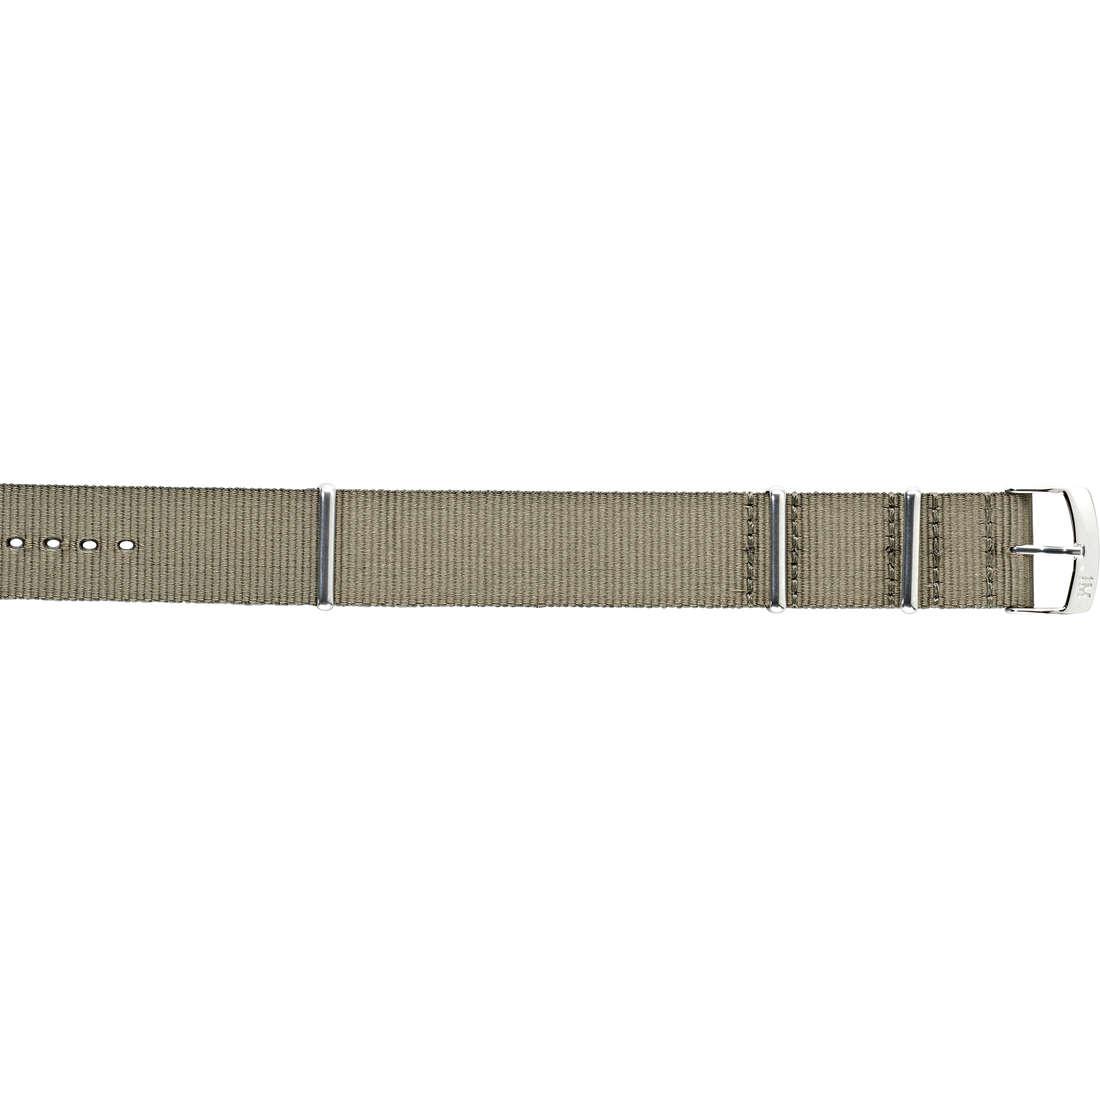 watch watch bands watch straps man Morellato Morellato 1930 A01U3972A74073CR22